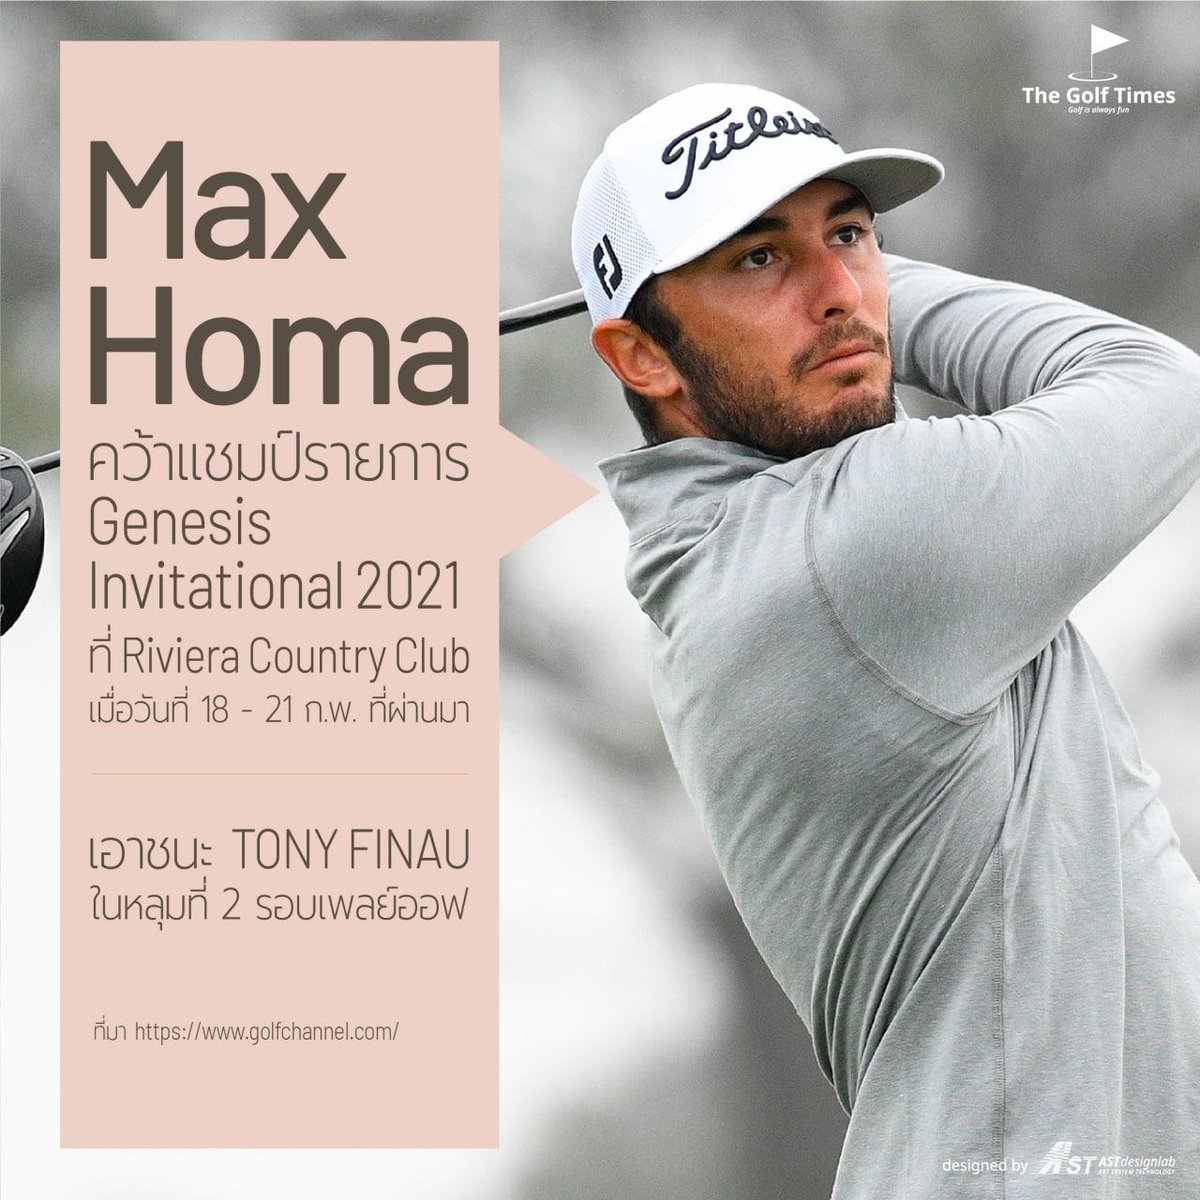 Max Homa คว้าแชมป์รายการ Genesis Invitational 2021 ที่ Riviera Country Club 🏆 @maxhoma23  #golfnews #GenesisInvitational #PGATour #GenesisInvitational2021 #MaxHoma #CheersToTheChampion #Champion #golf #golfpro #กอล์ฟ #นักกอล์ฟ #골프 #골프스윙 #골프스타그램 #TheGolfTimes https://t.co/cWPaHG3CNn